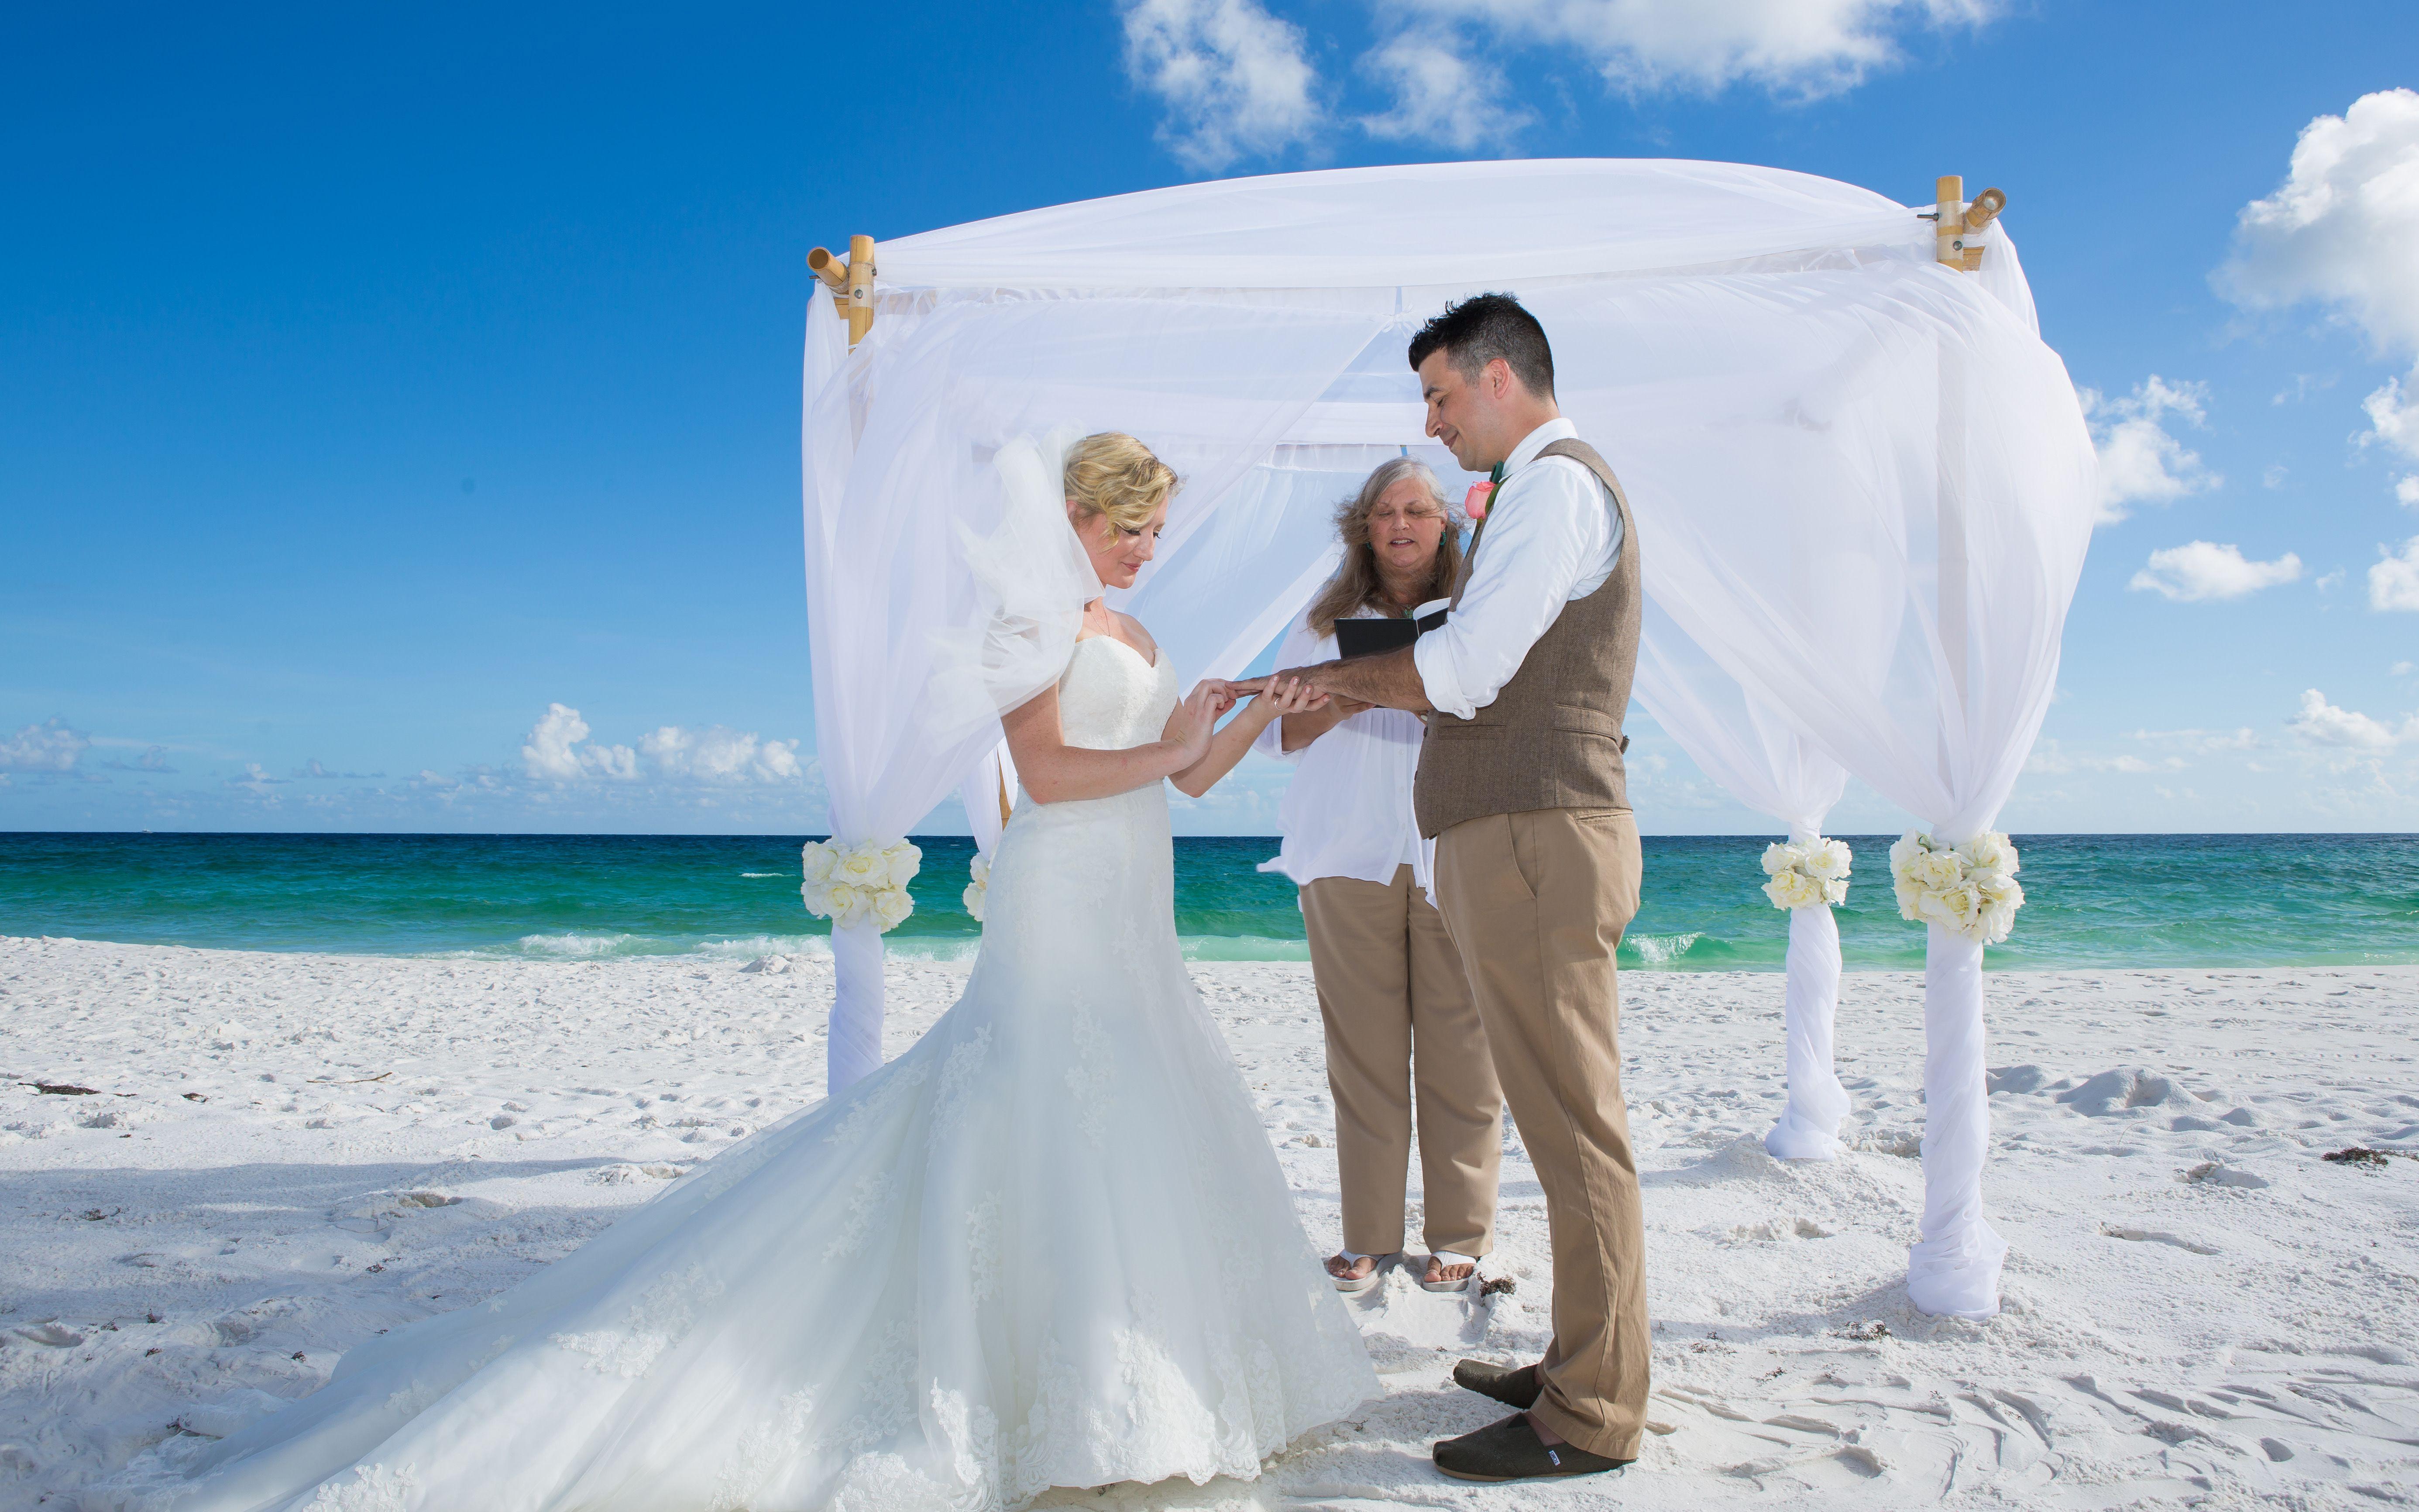 Destin Wedding In 2020 Beach Ceremony Beach Wedding Florida Beach Wedding